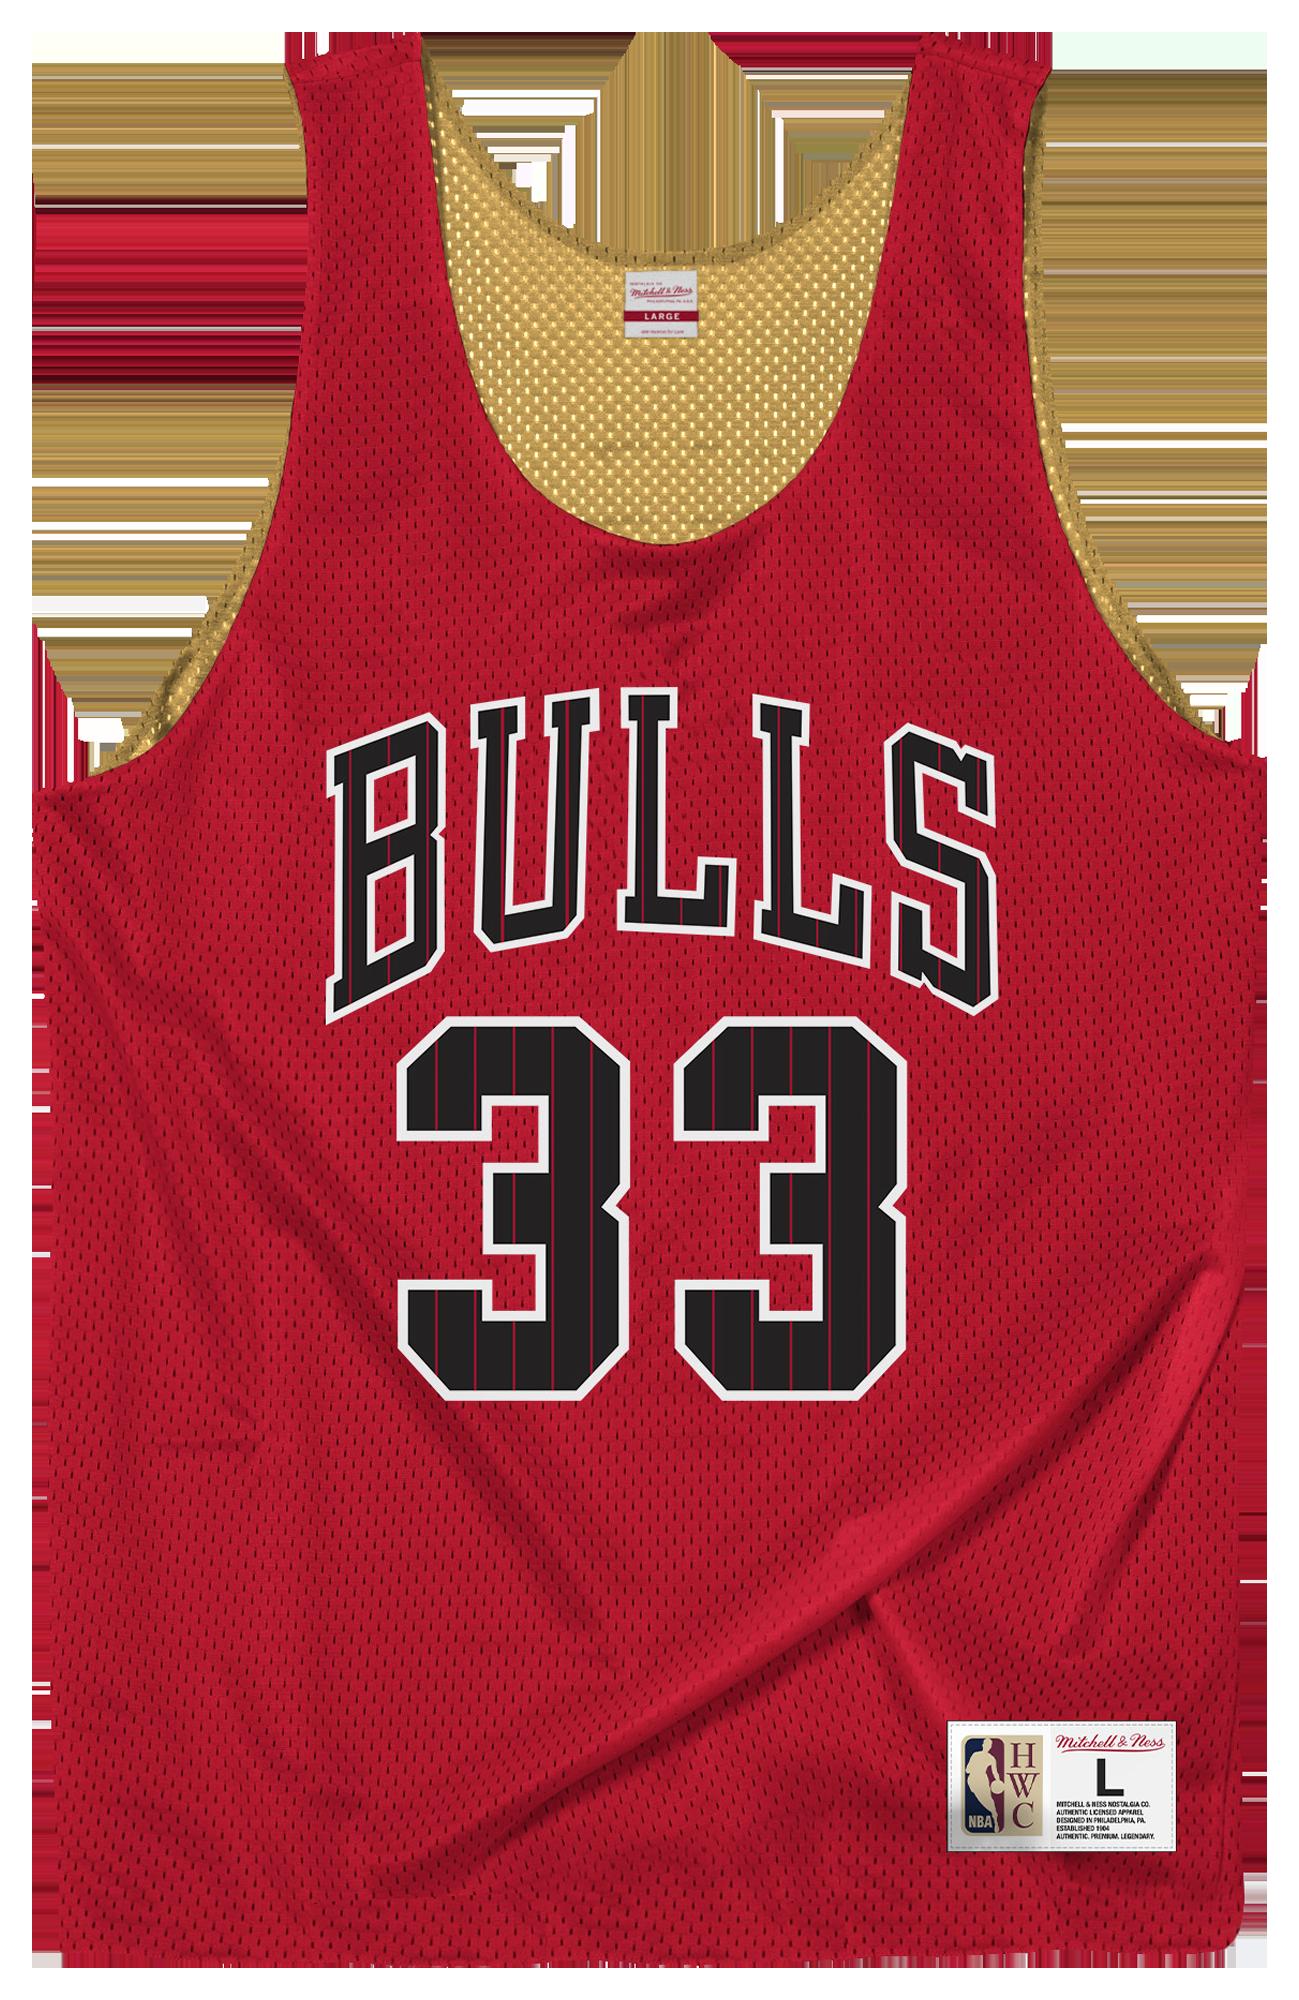 THDR Fashion Sportswear Short de basketball pour homme Chicago Bulls 2019//20 Basketball uniforme r/étro Swingman Jersey brod/é Short Rouge